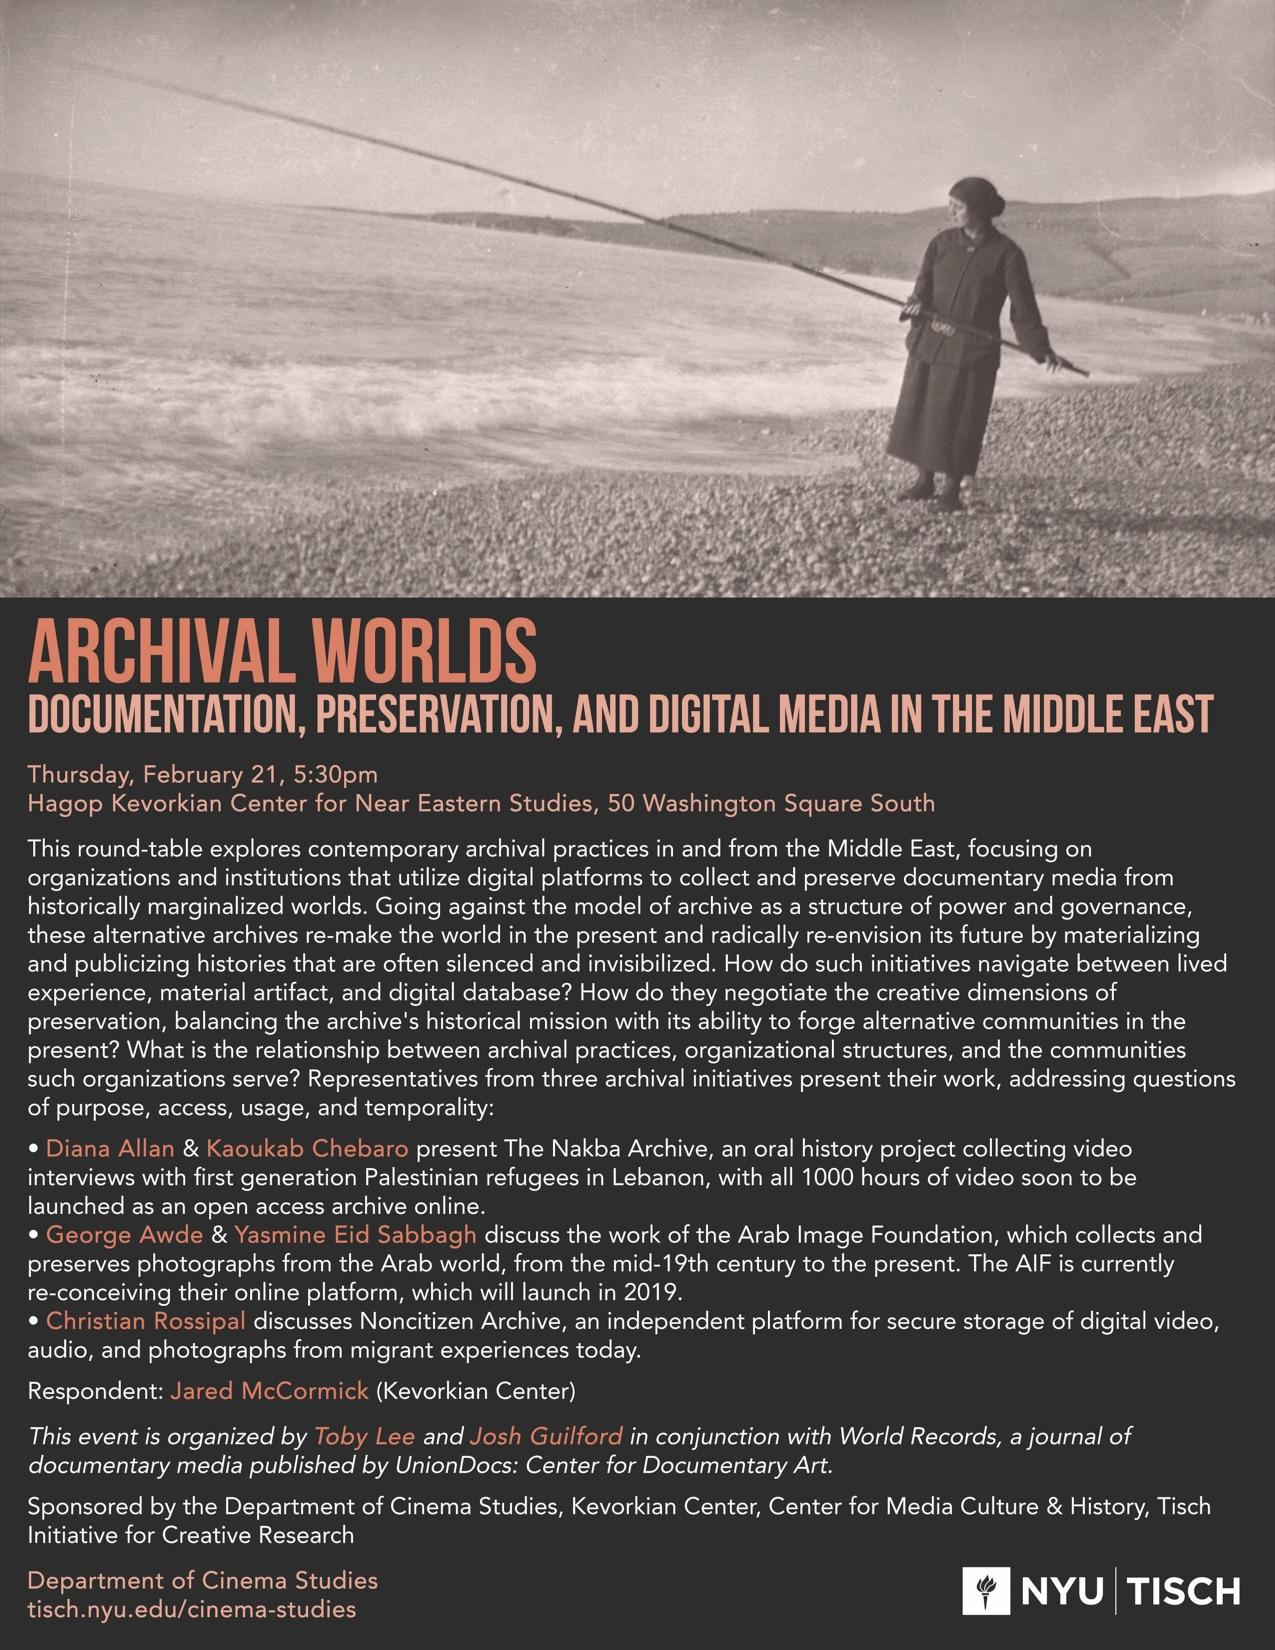 Archival Worlds 2.21.19.jpg